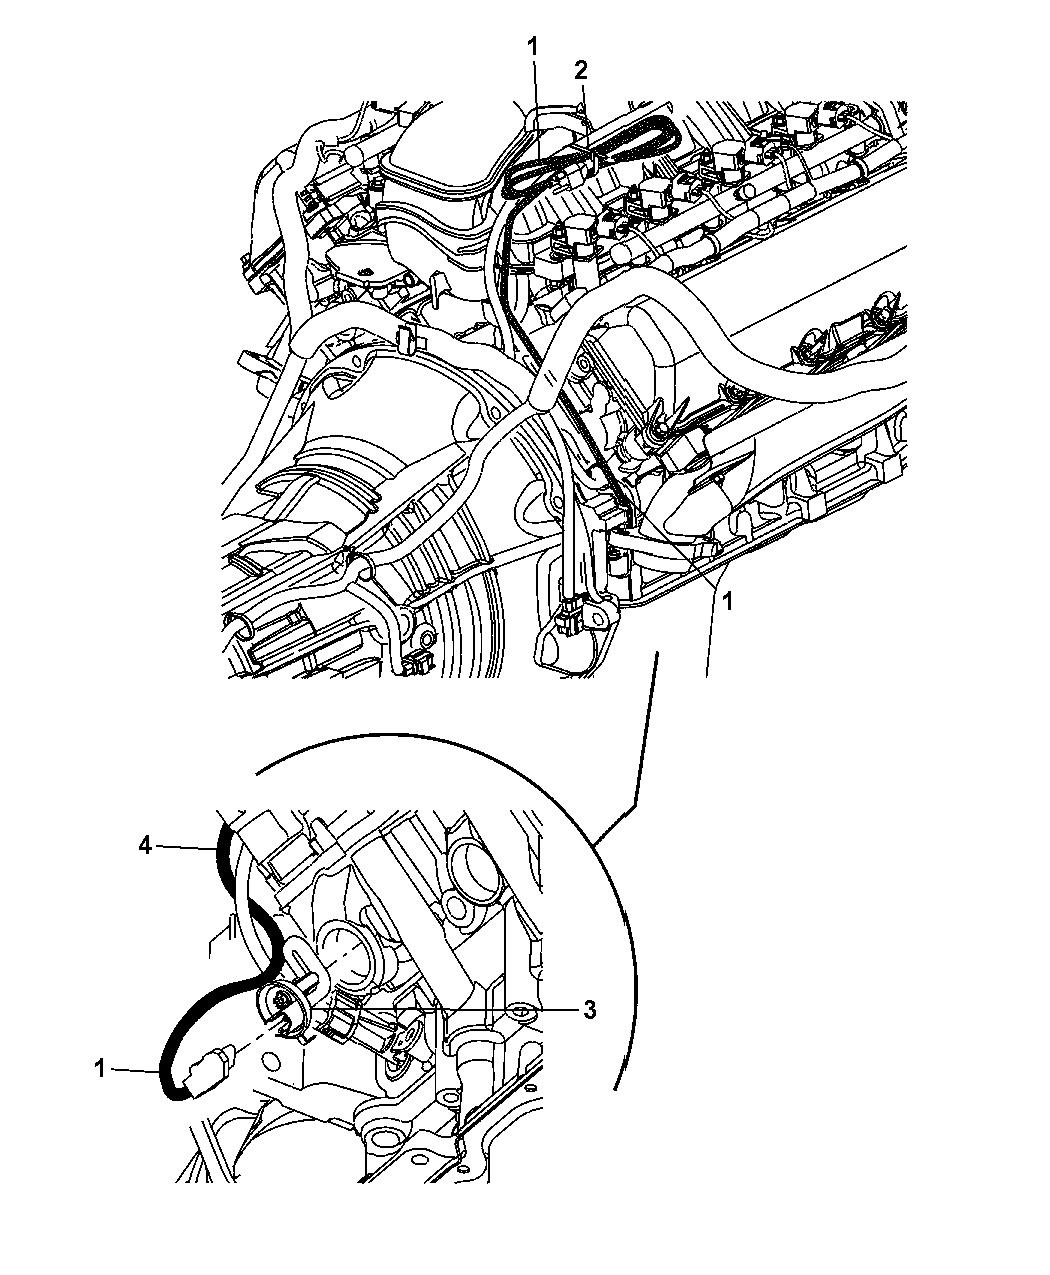 2010 liberty engine diagram 2010 jeep liberty engine cylinder block heater  2010 jeep liberty engine cylinder block